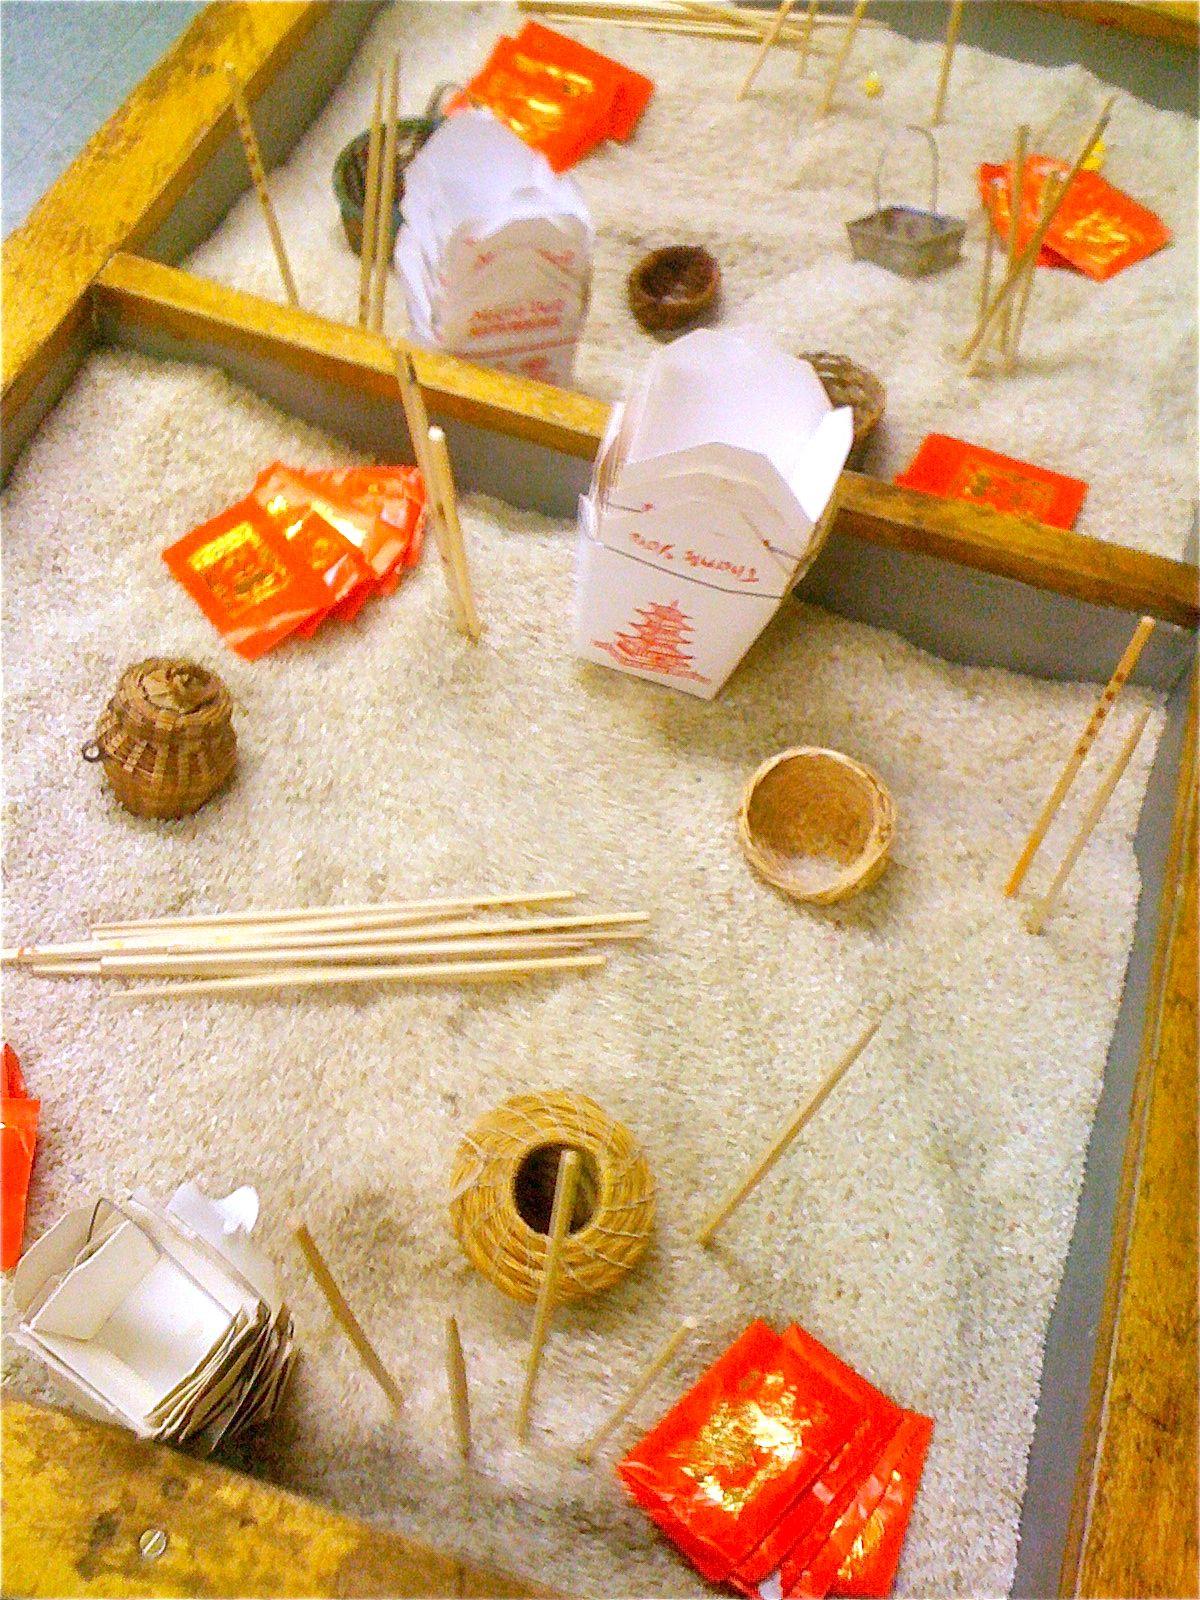 Chinese New Year Sensory Table Rice Chopsticks Take Out